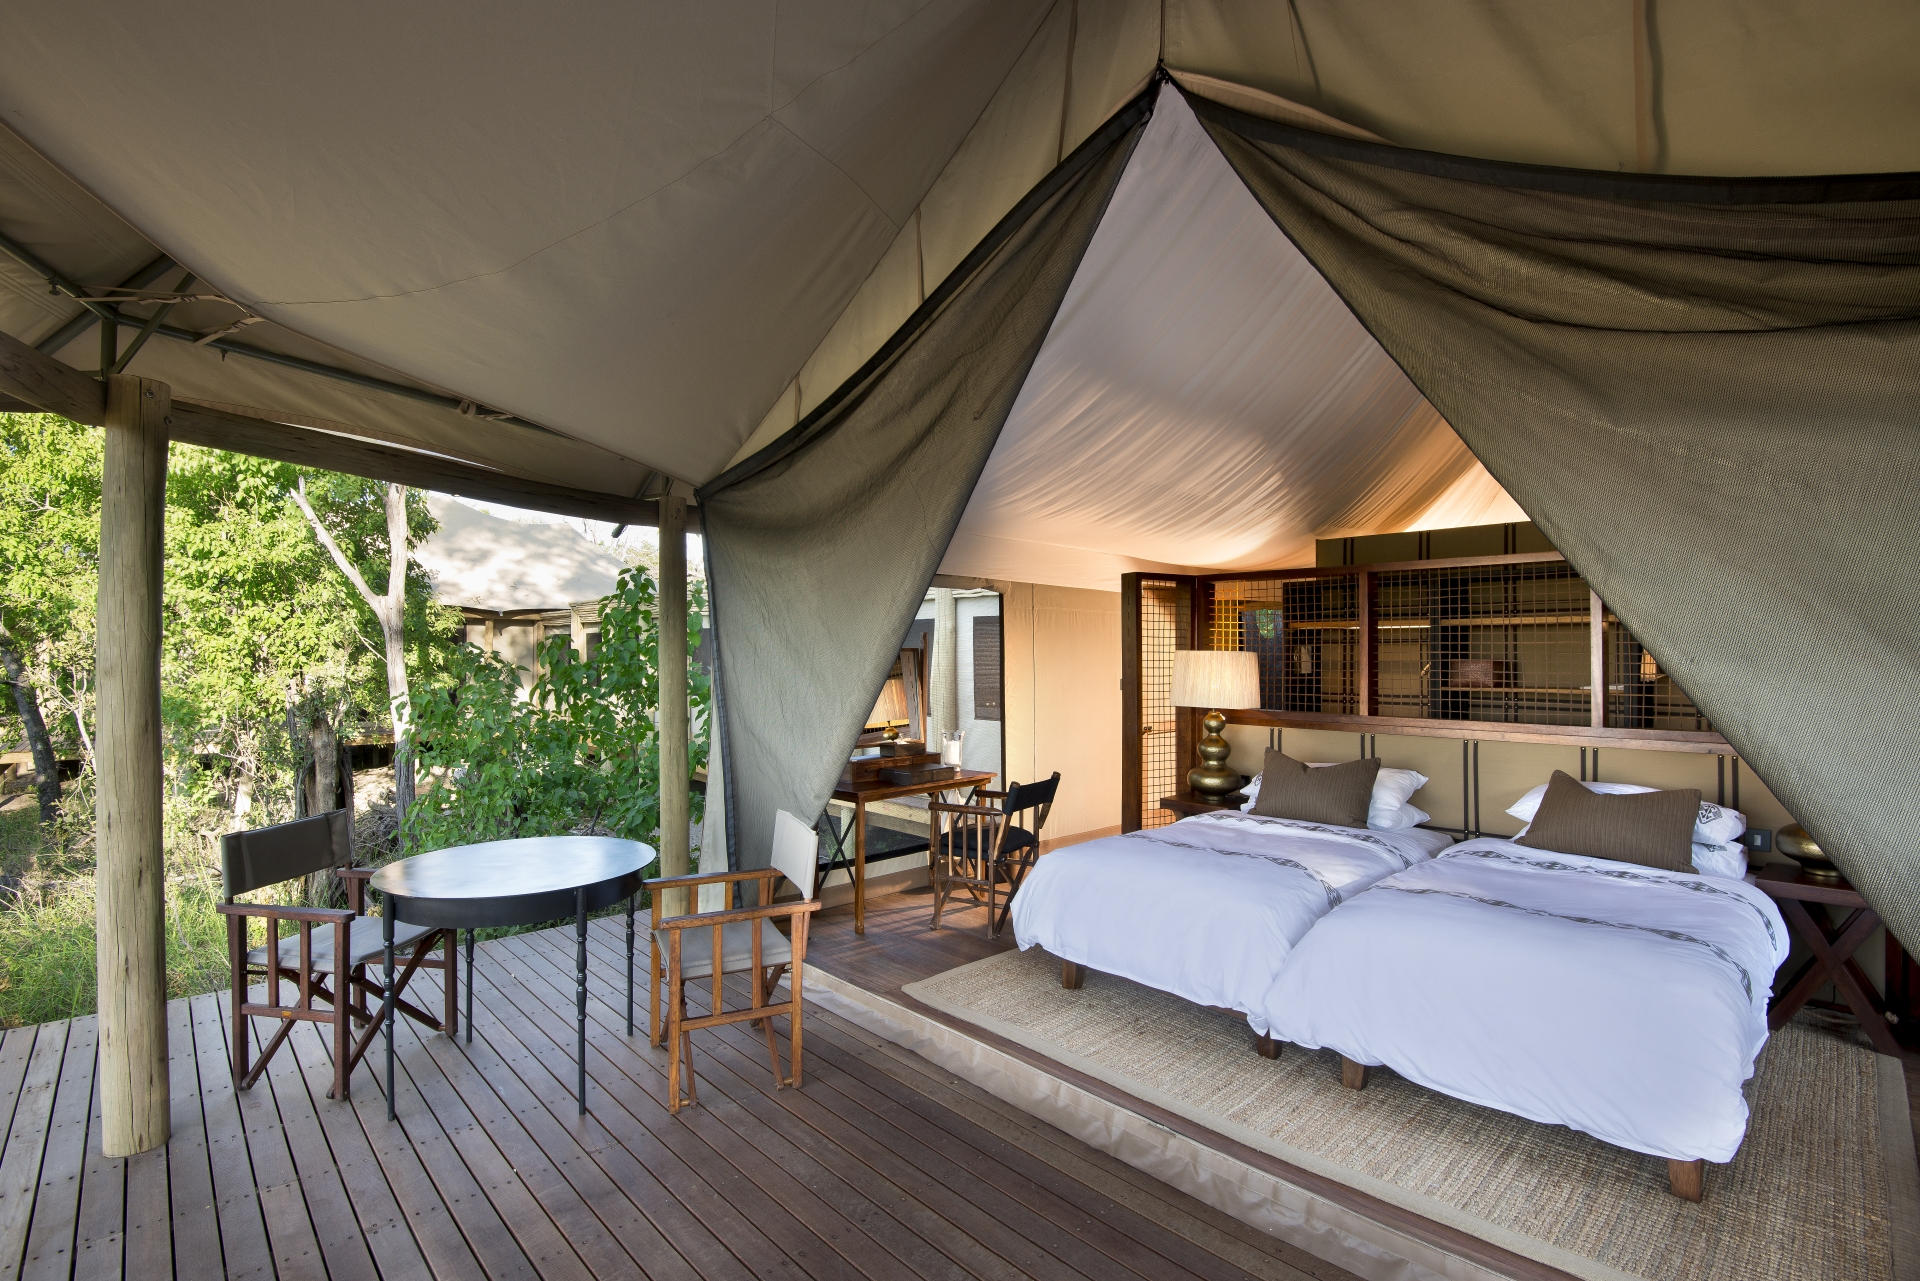 andBeyond-Nxabega-Okavango-Tented-Camp-Family-Suite-Small.jpg